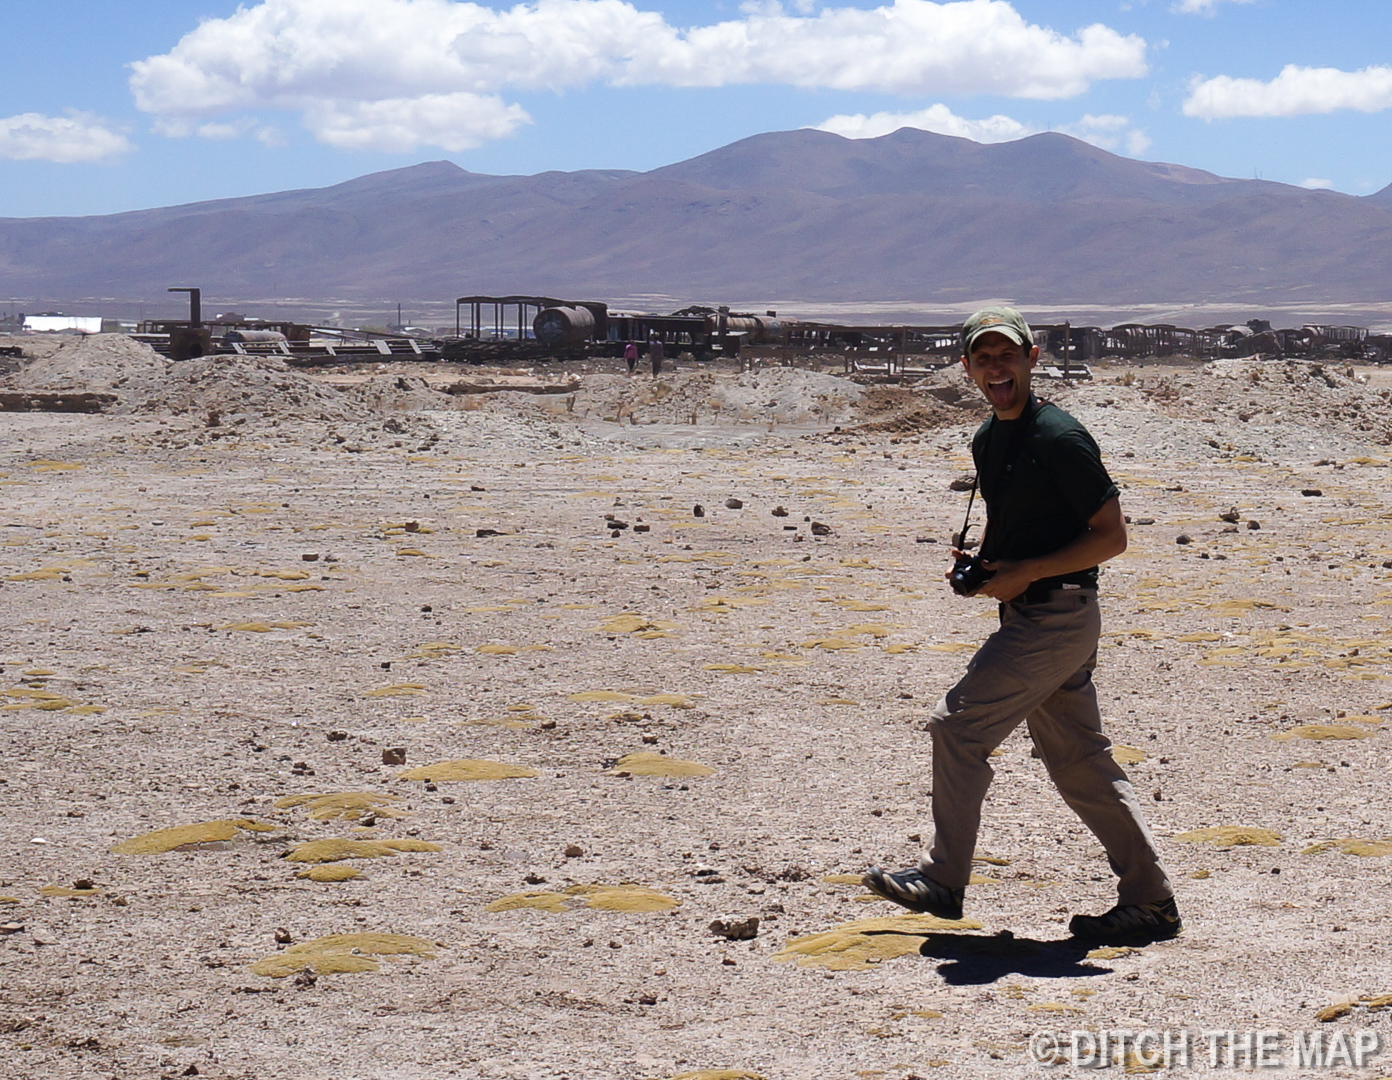 Scott goofing off at the Train Graveyard in Salar de Uyuni, Bolivia